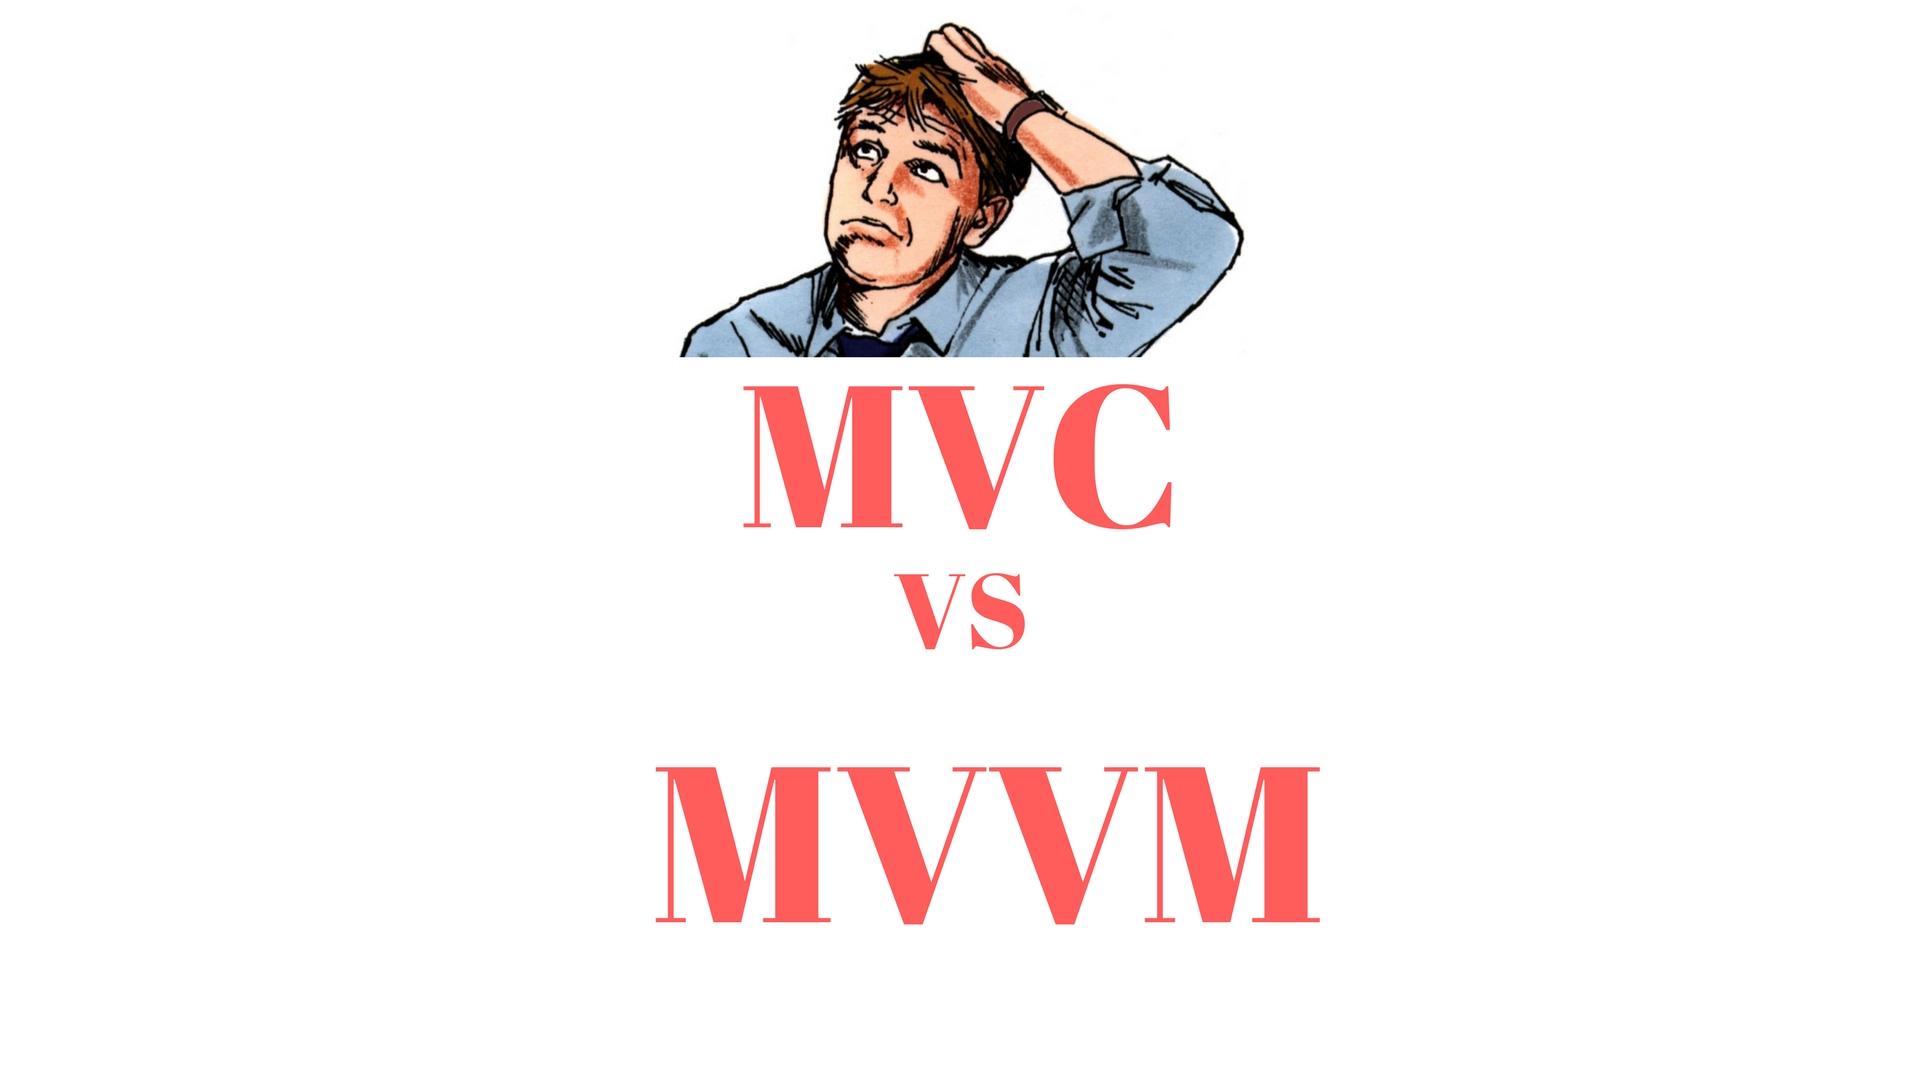 MVC or MVVM